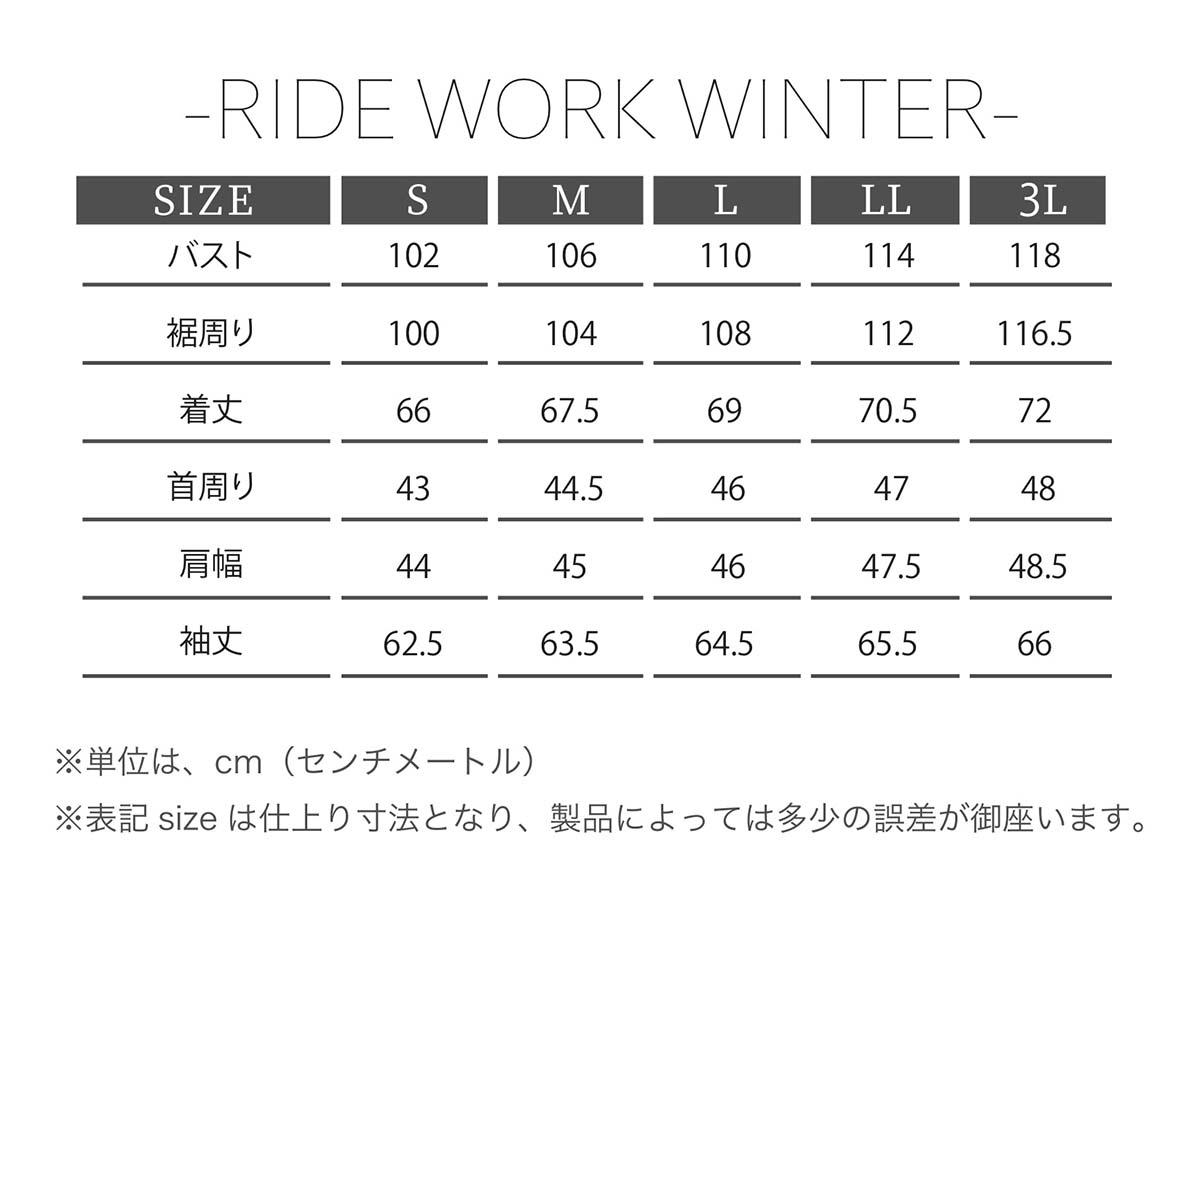 KADOYA(カドヤ) K'S PRODUCT RIDE WORK SHIRT WINTER